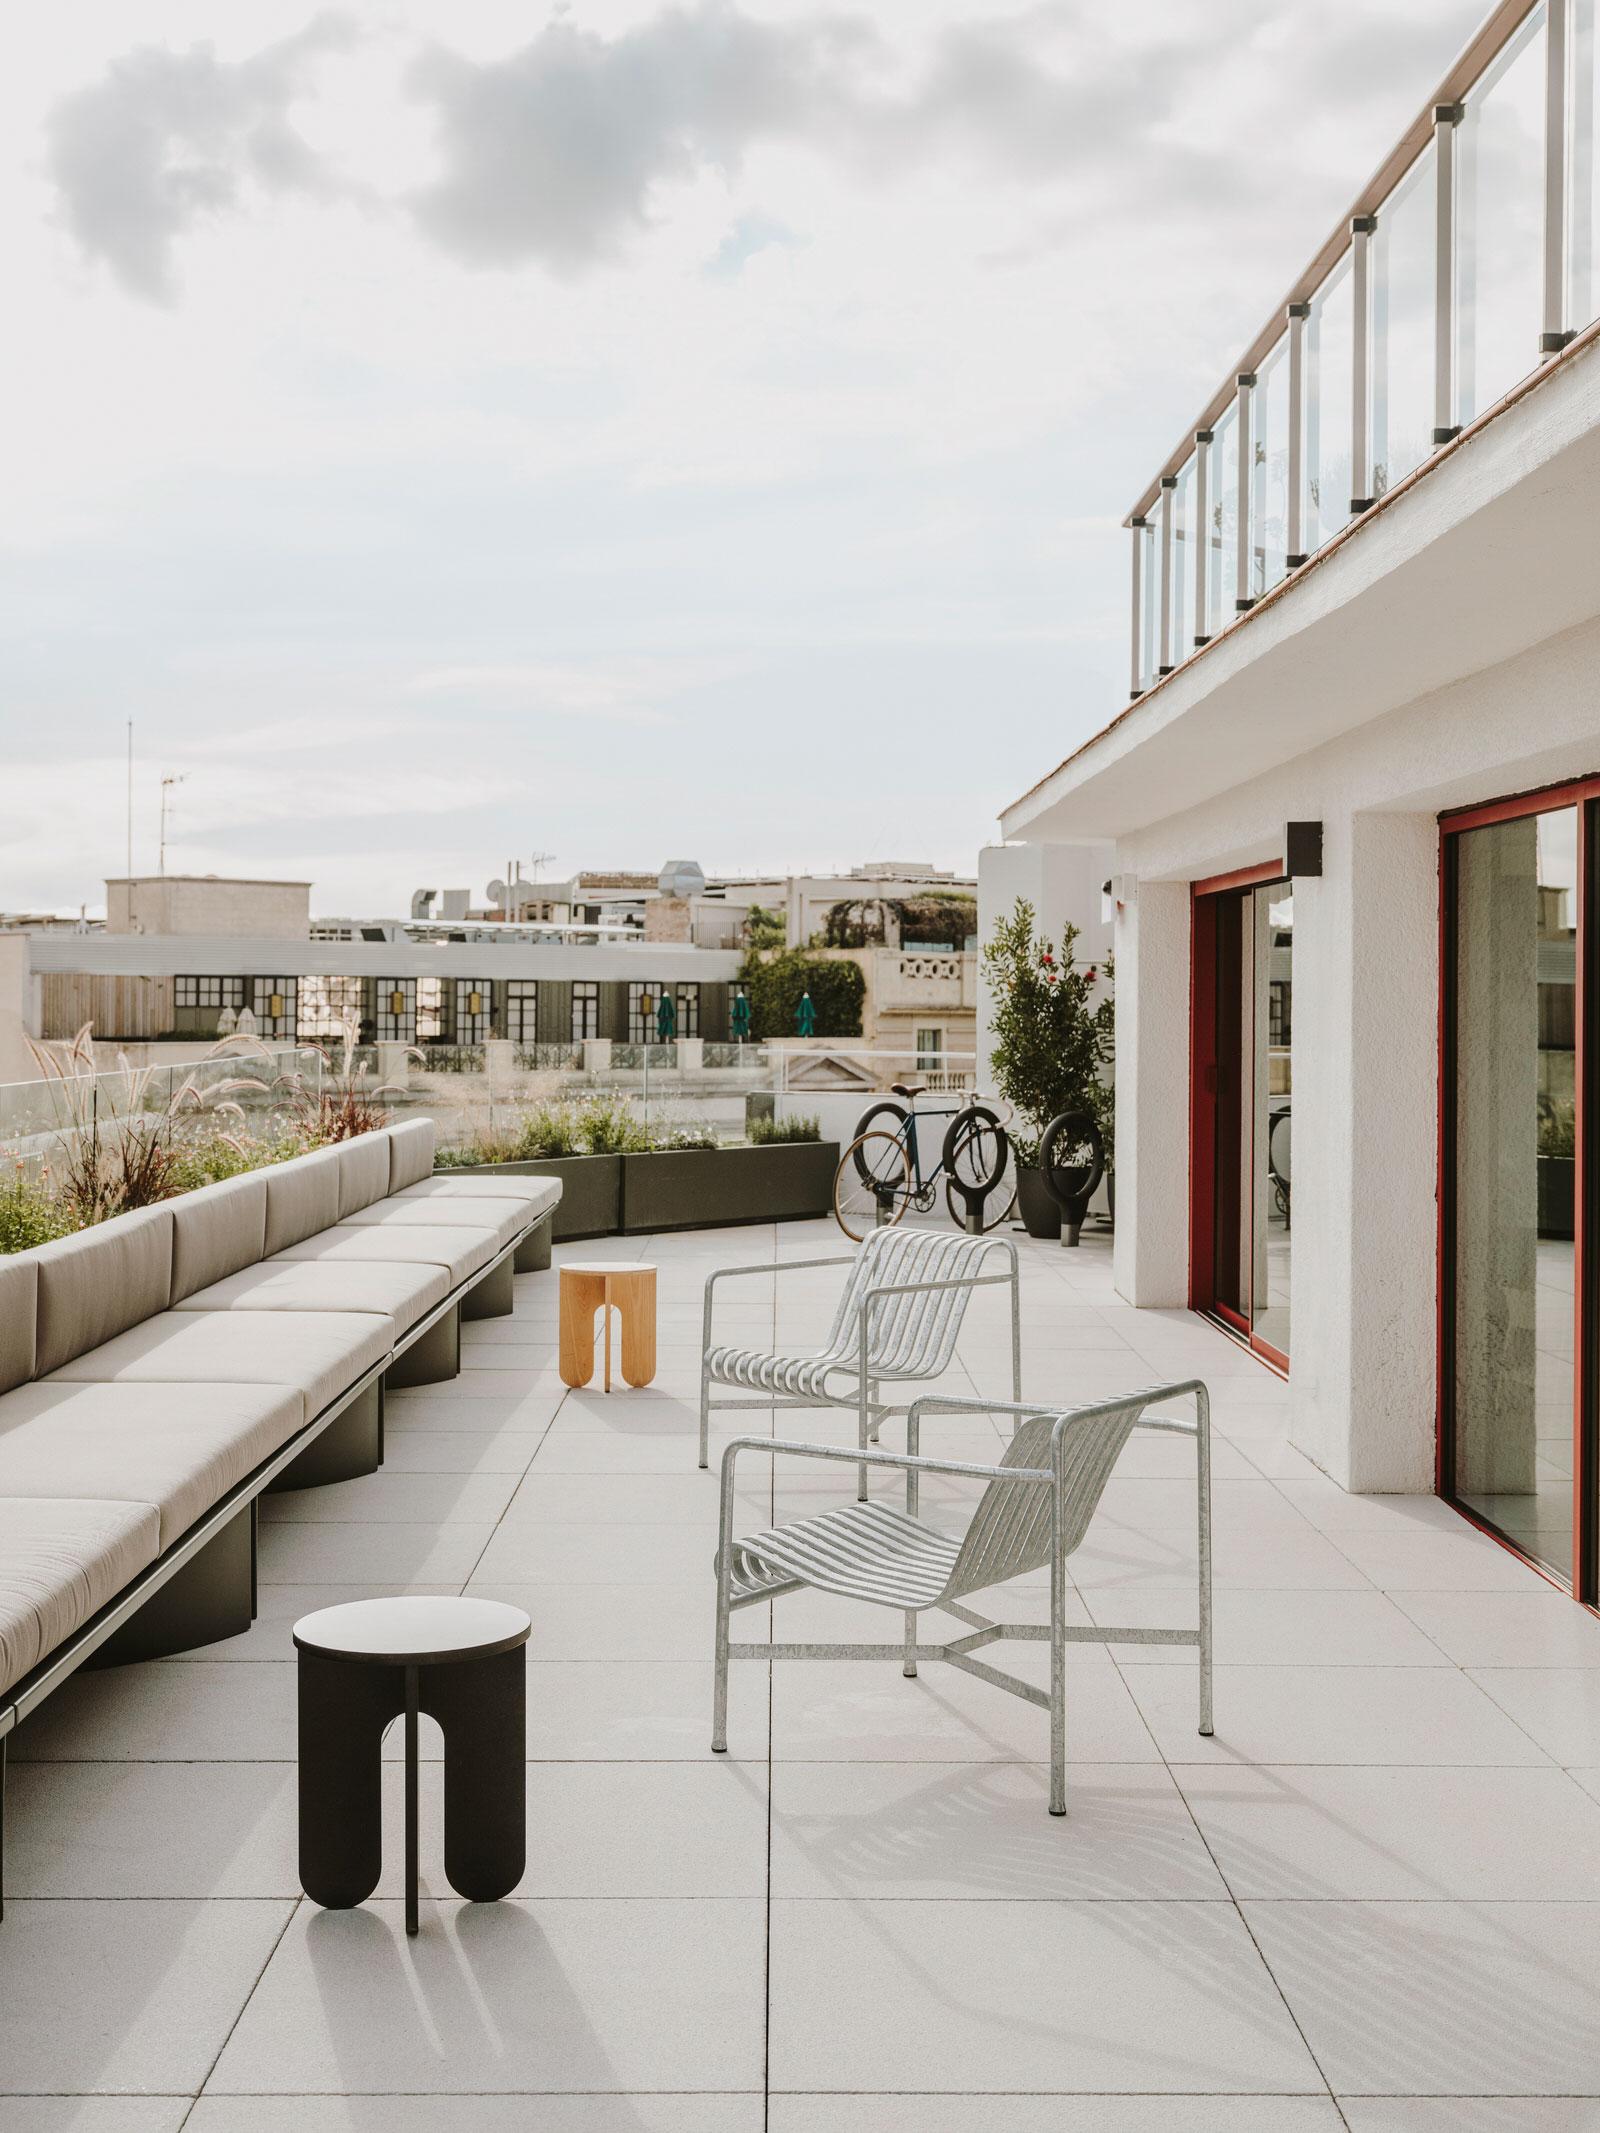 Mesura Architecture Design Cloudworks Penthouse Office Barcelona Photo Salva Lopez Yellowtrace 01